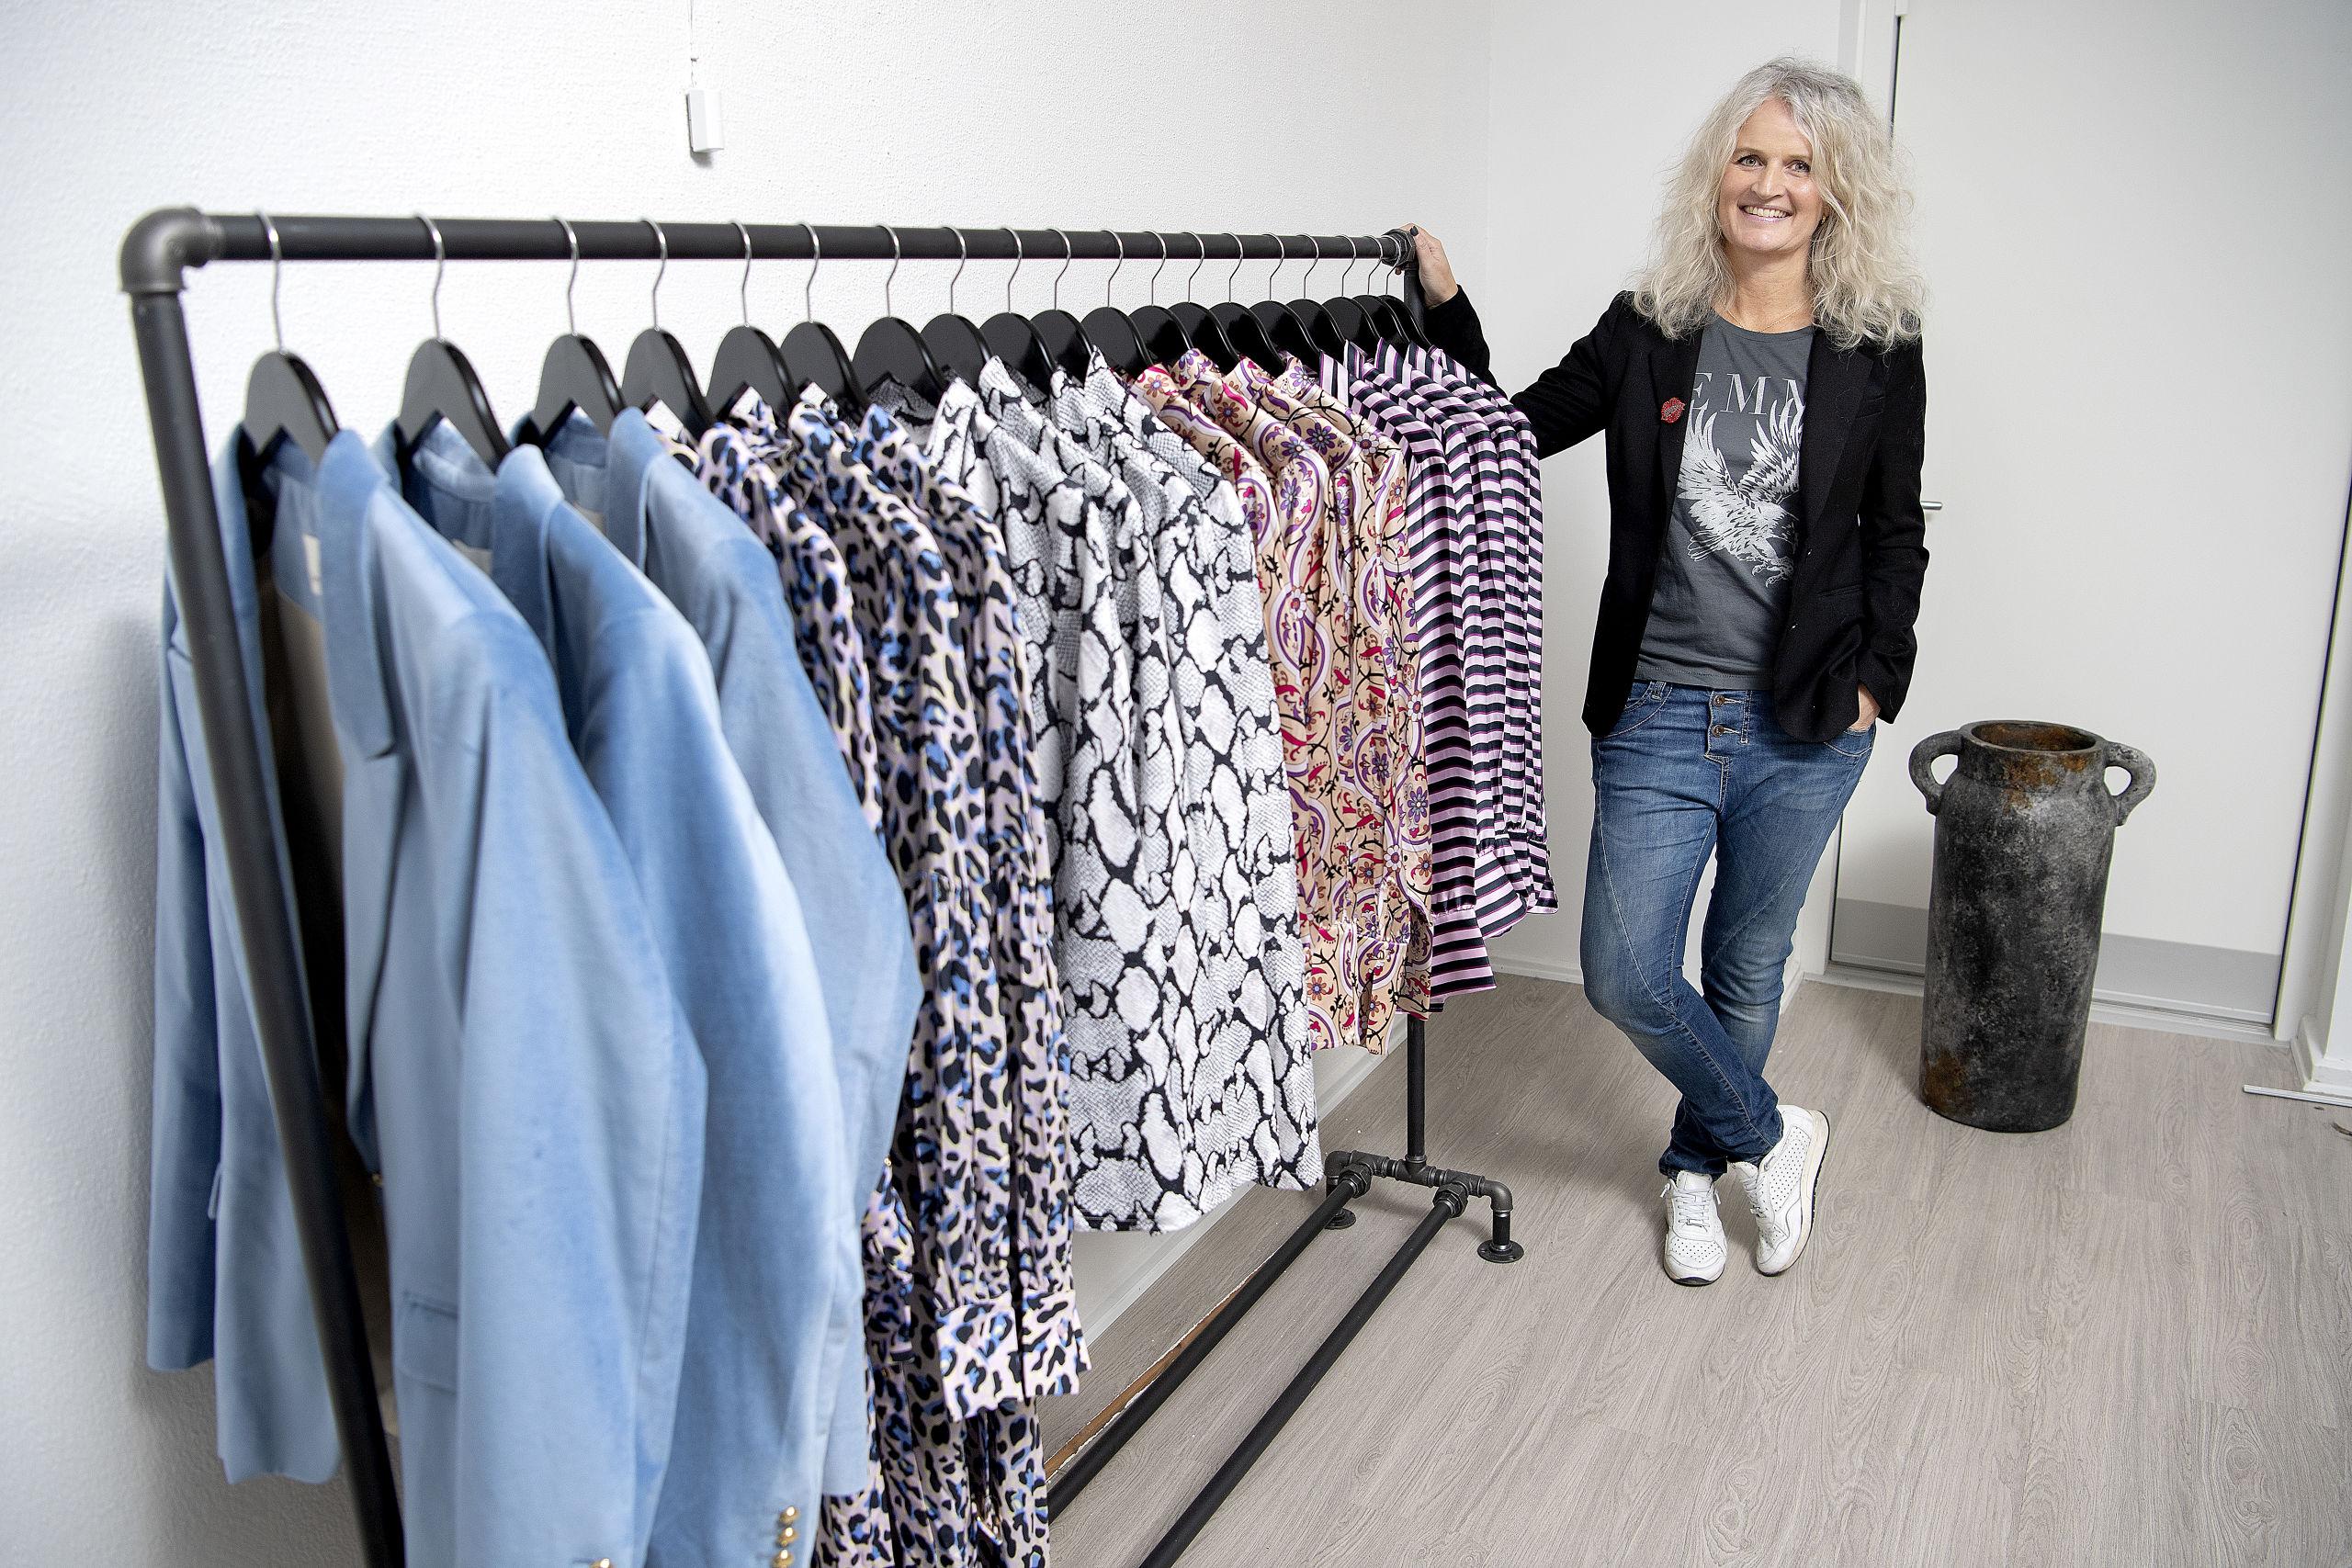 Nu åbner Karina snart sin tøjbutik